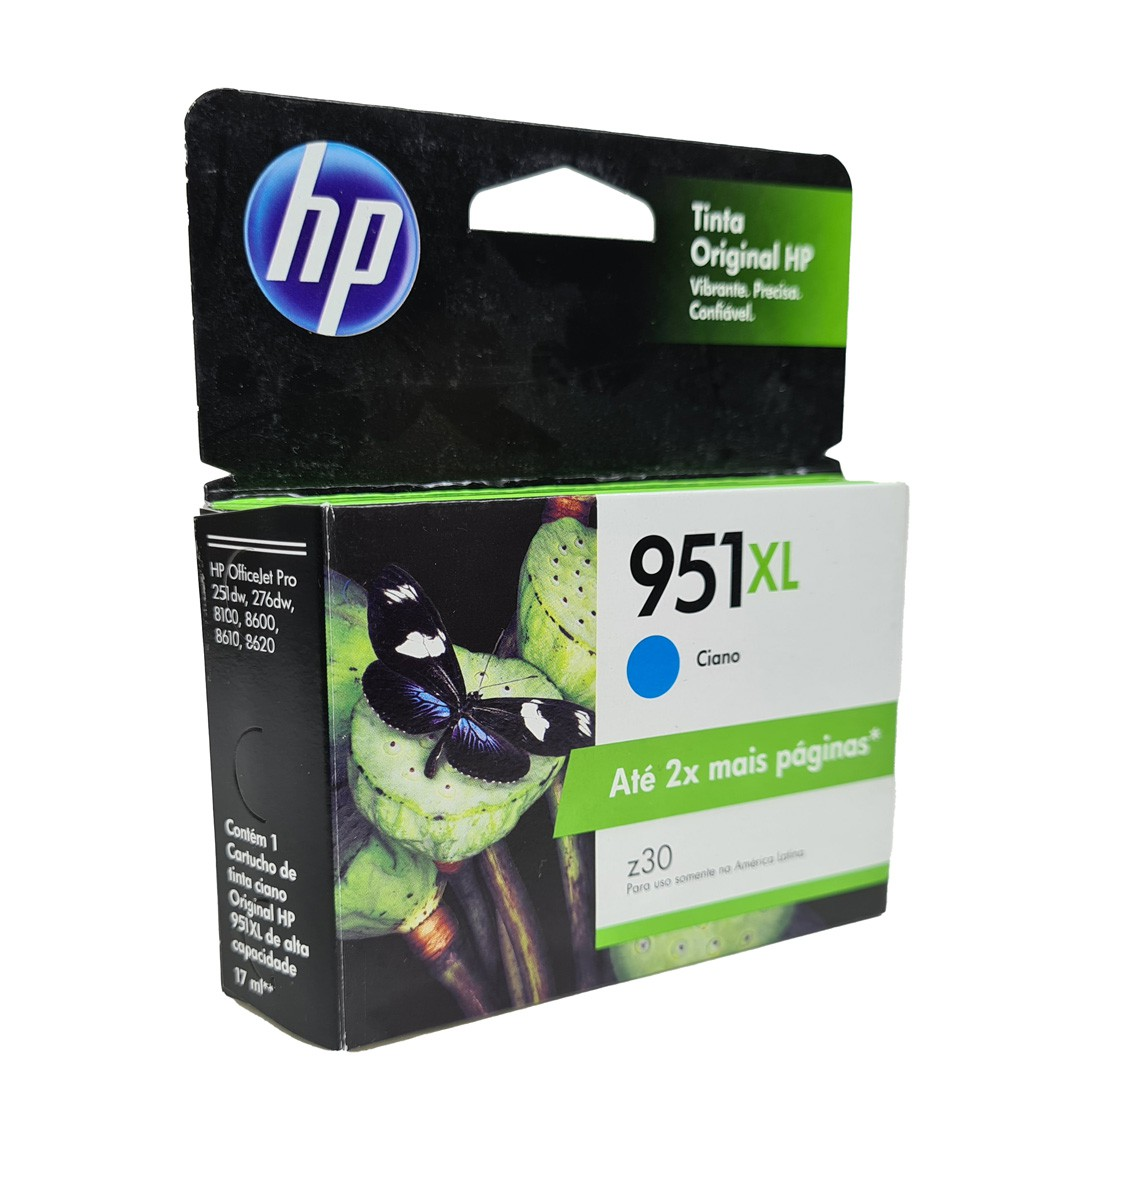 Cartucho HP 951XL Ciano CN046AL 17ml para 8100 e 8600